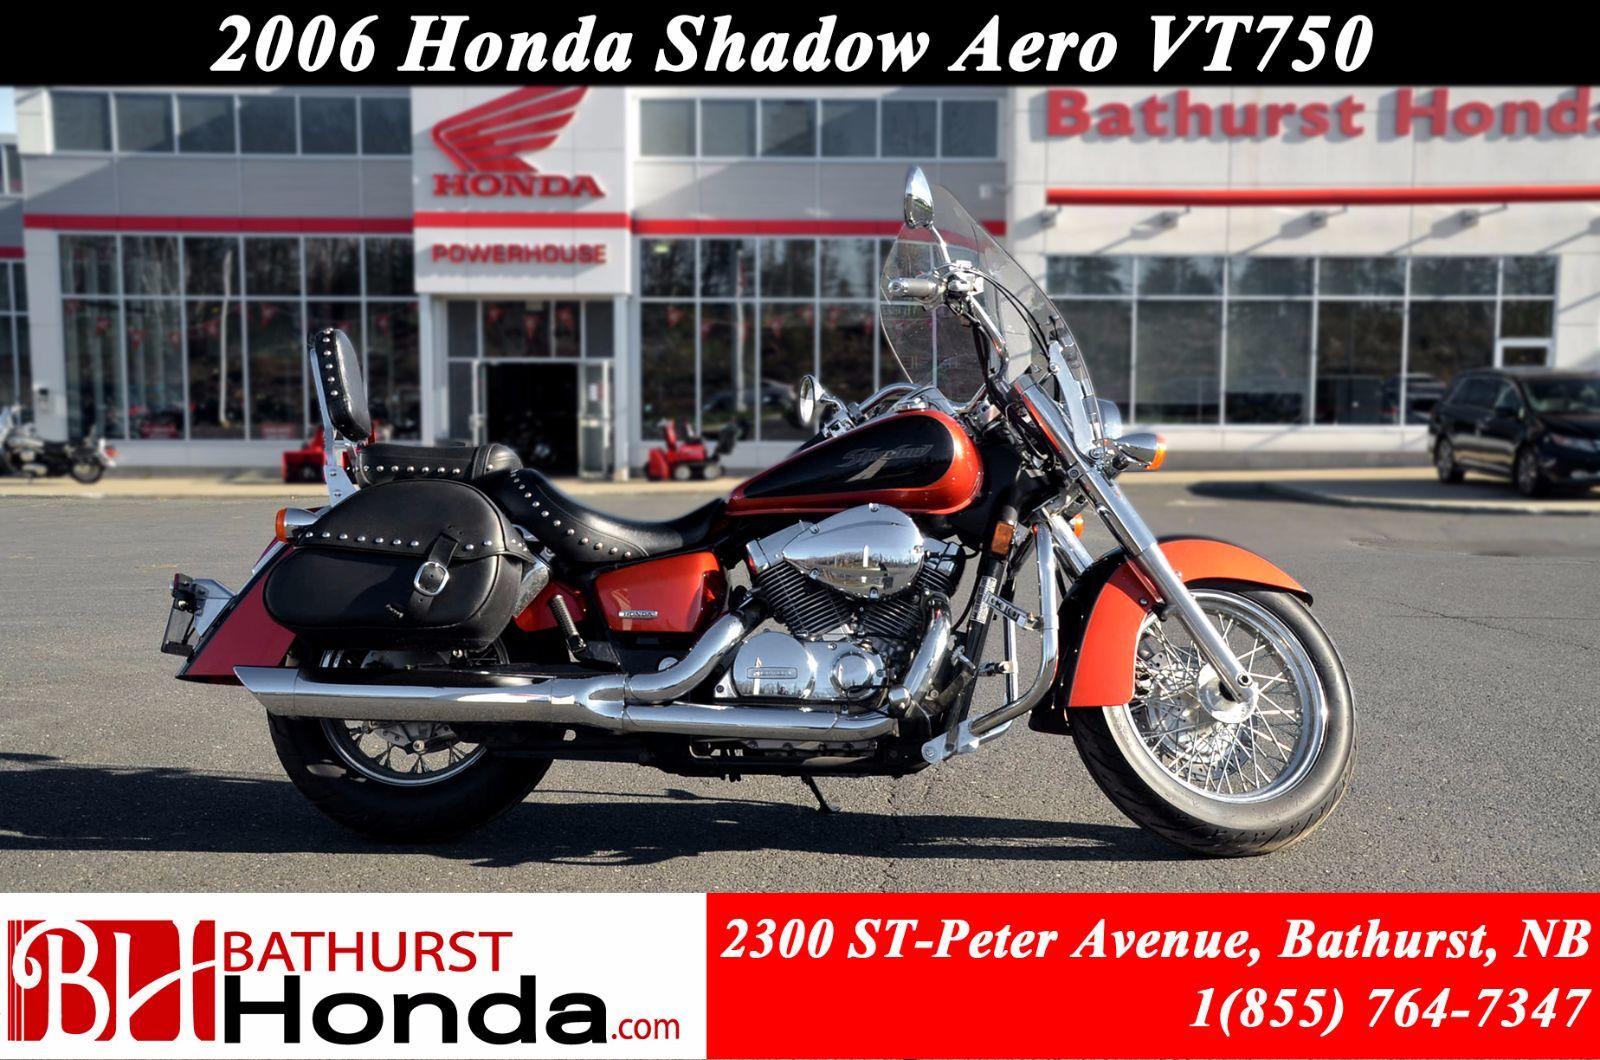 Used 2006 Honda Shadow Aero Vt750 At Bathurst B6180a Bob Motorcycle